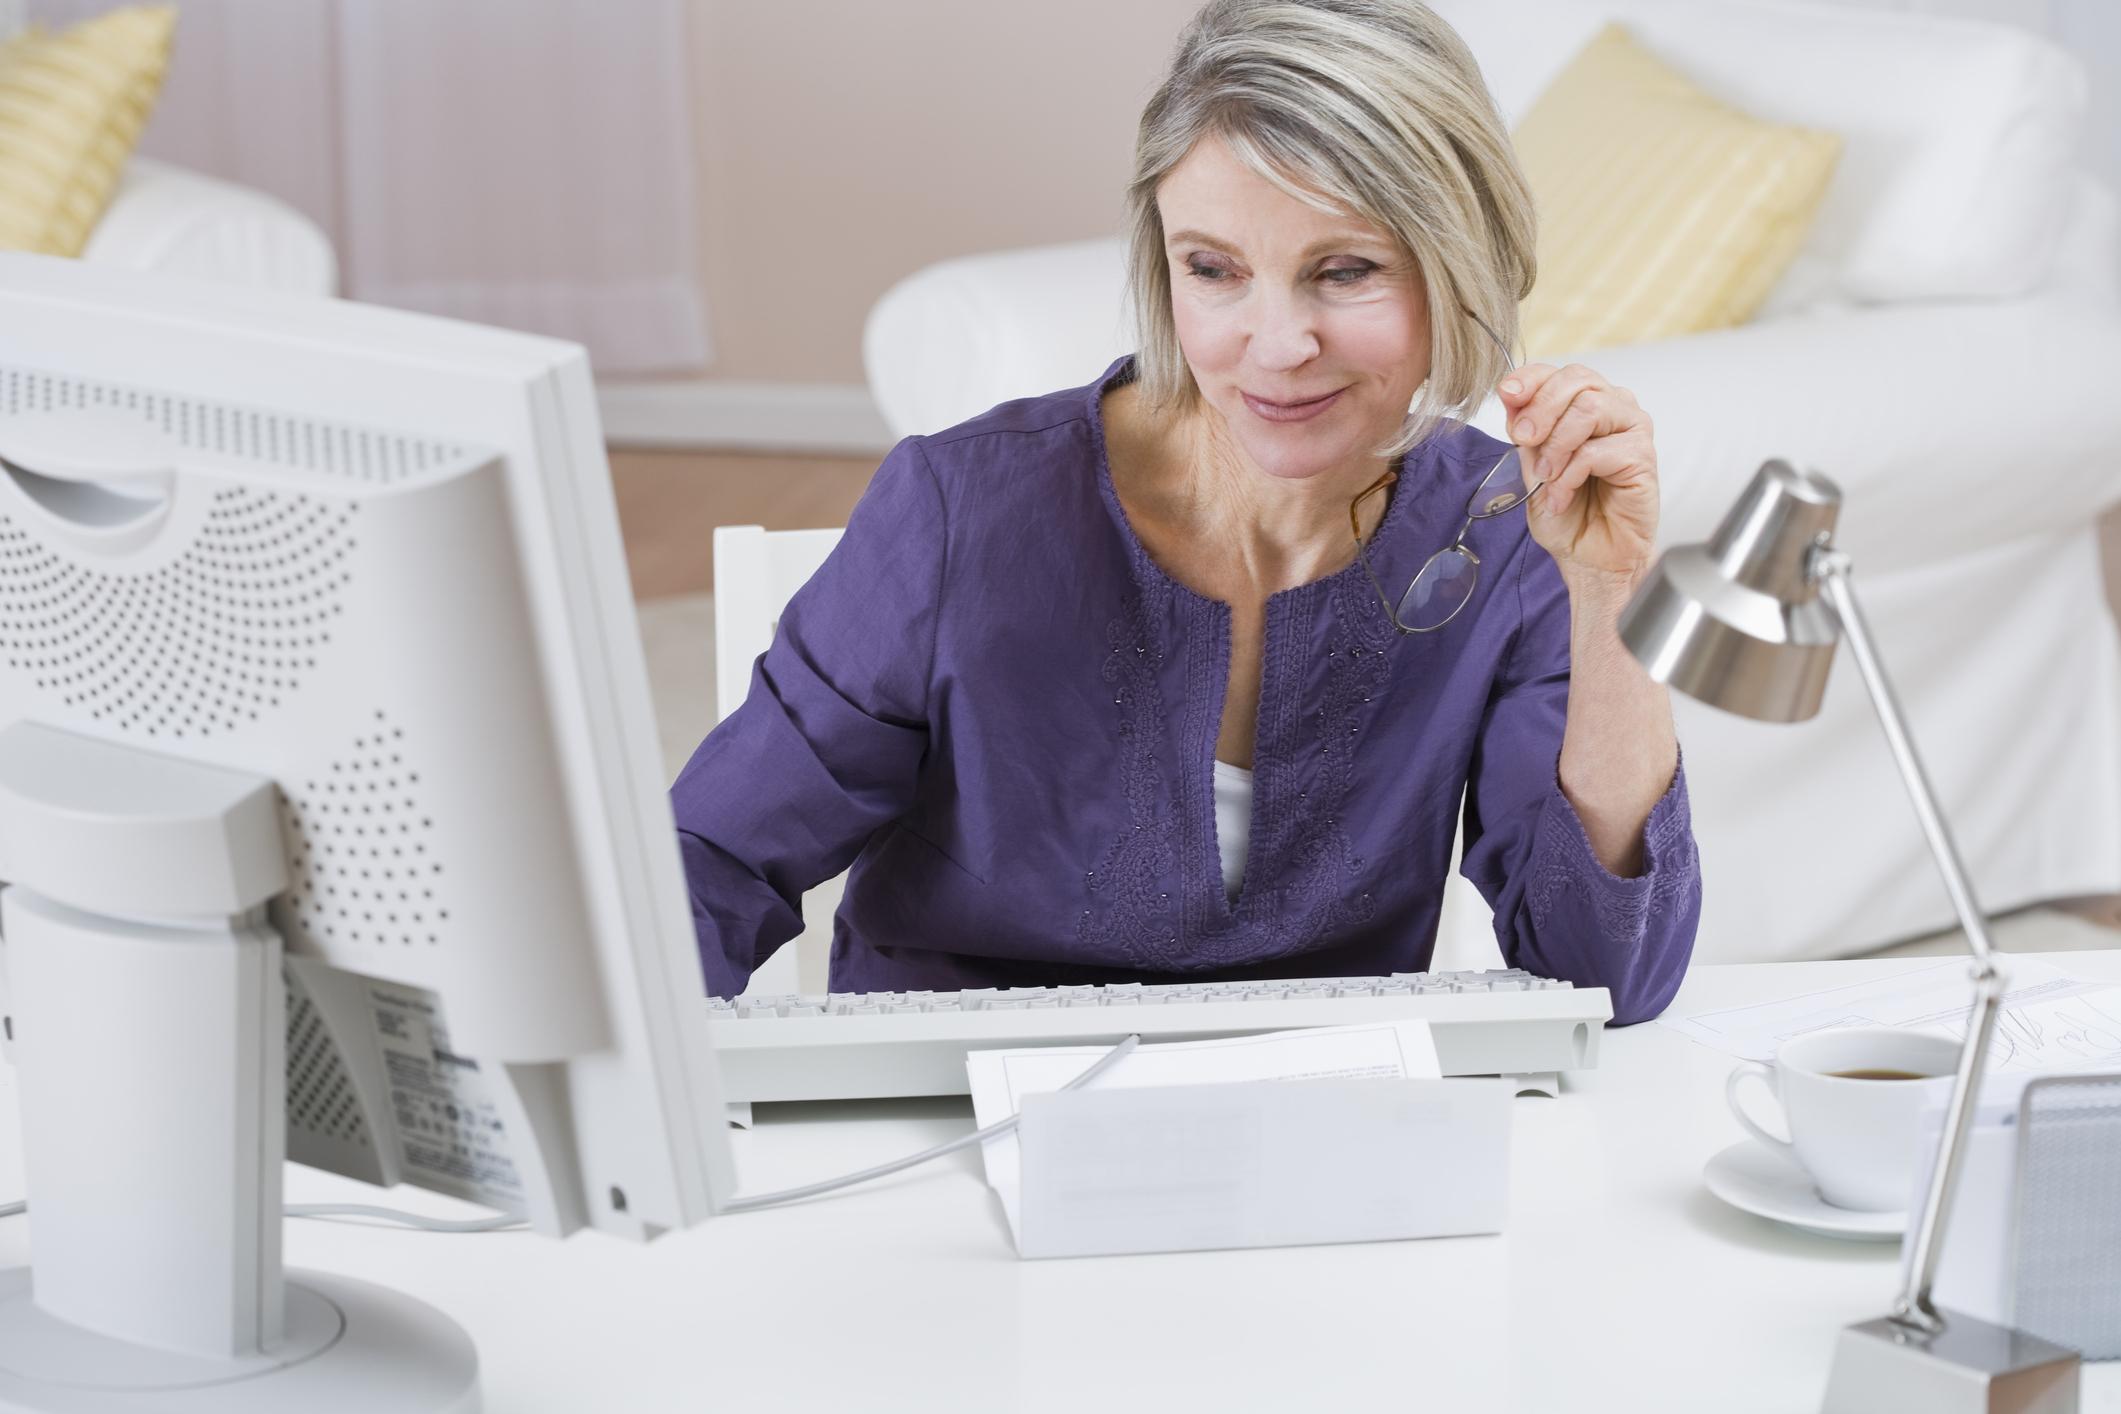 woman at computer desk.